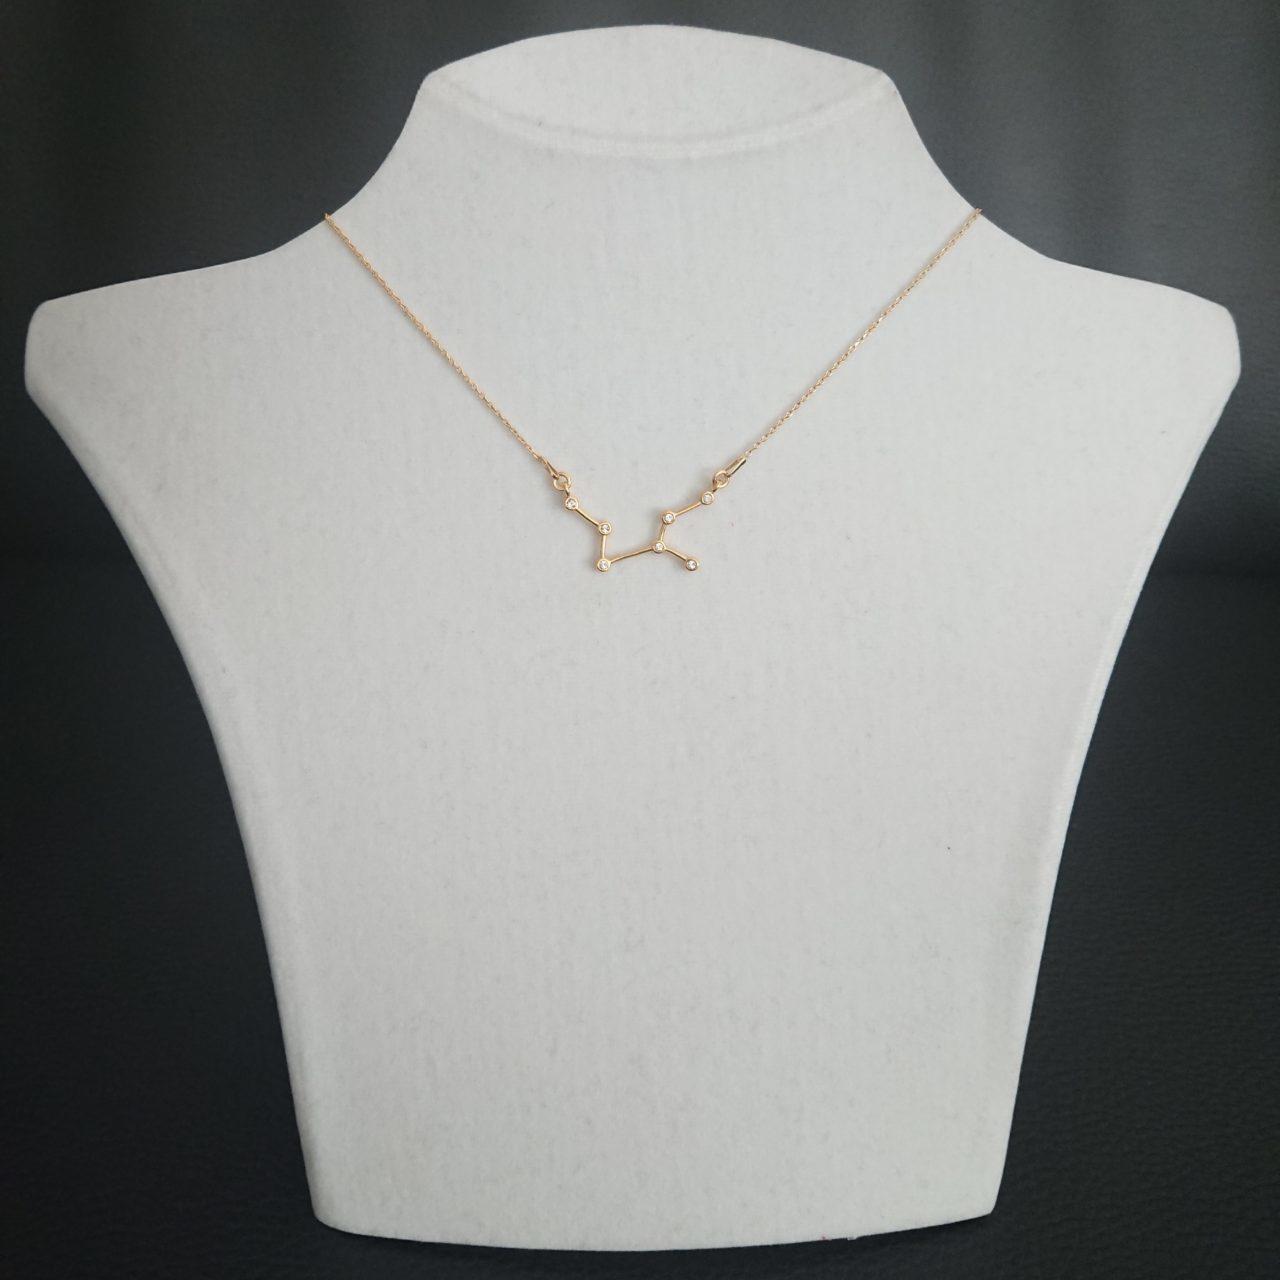 Sternbild Halskette - Jungfrau